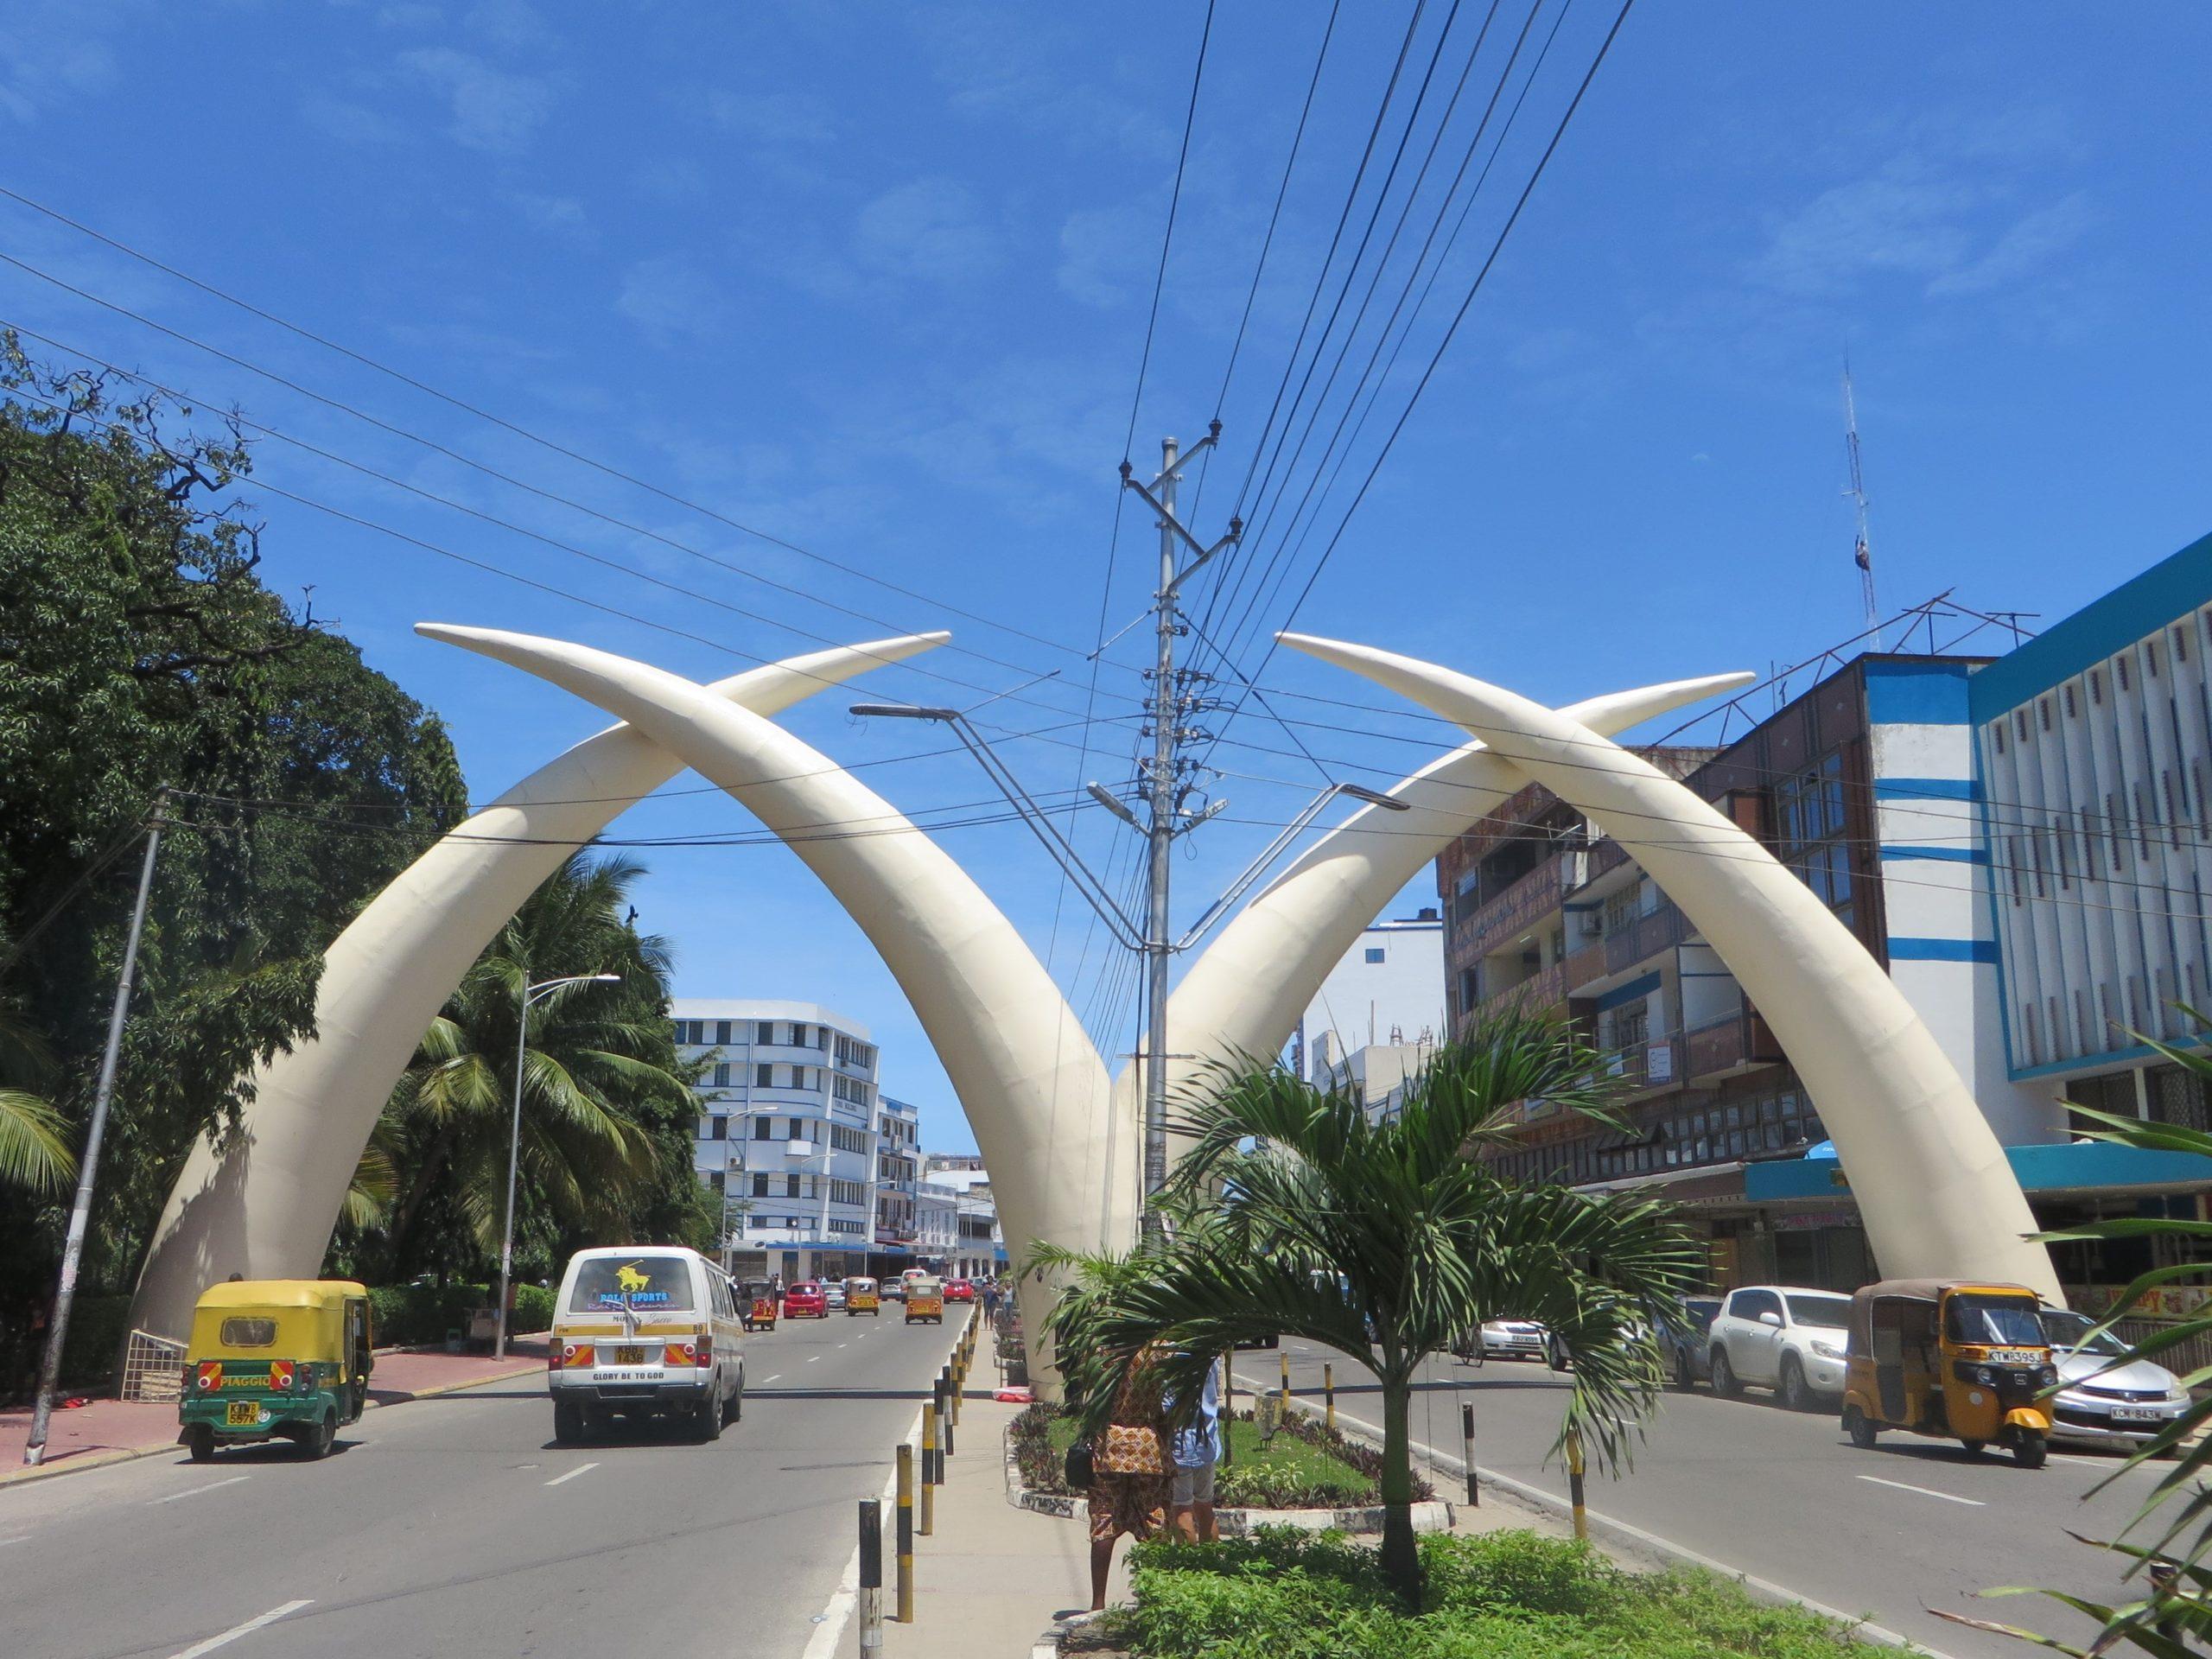 Mombasa - Tusks